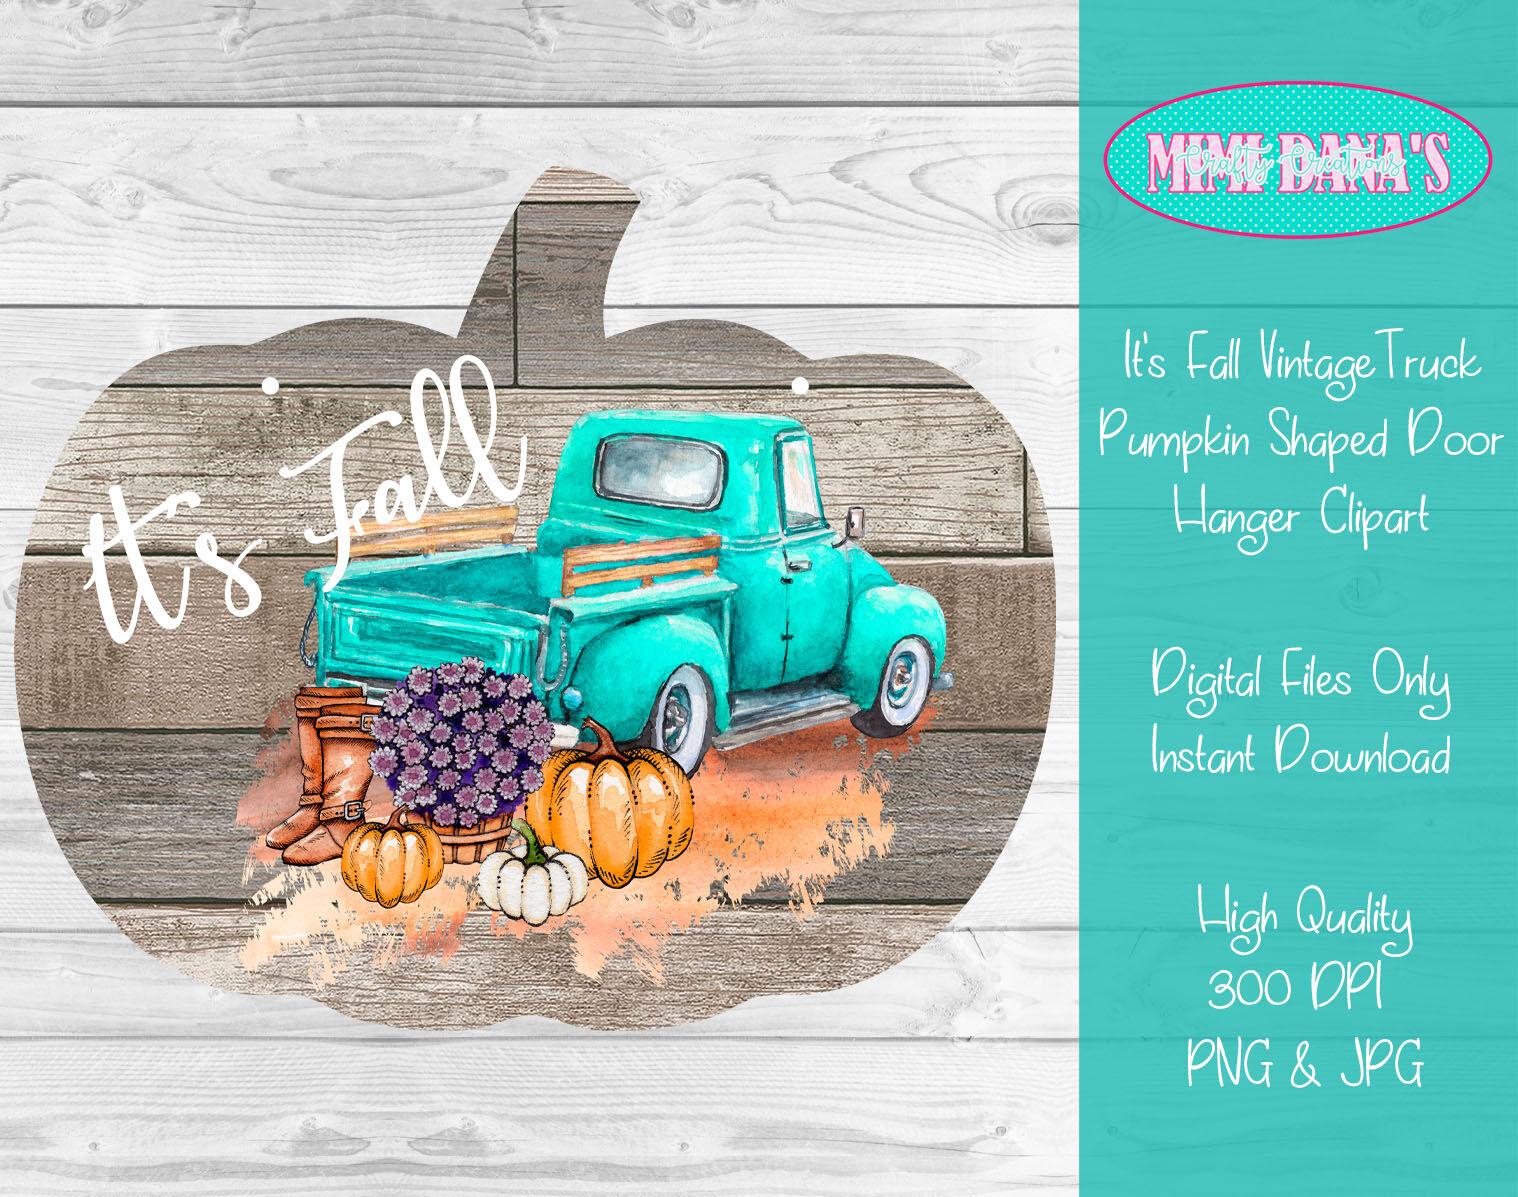 It S Fall Vintage Truck Pumpkin Shaped Door Hanger Clipart By Mimi Dana S Crafty Creations Thehungryjpeg Com